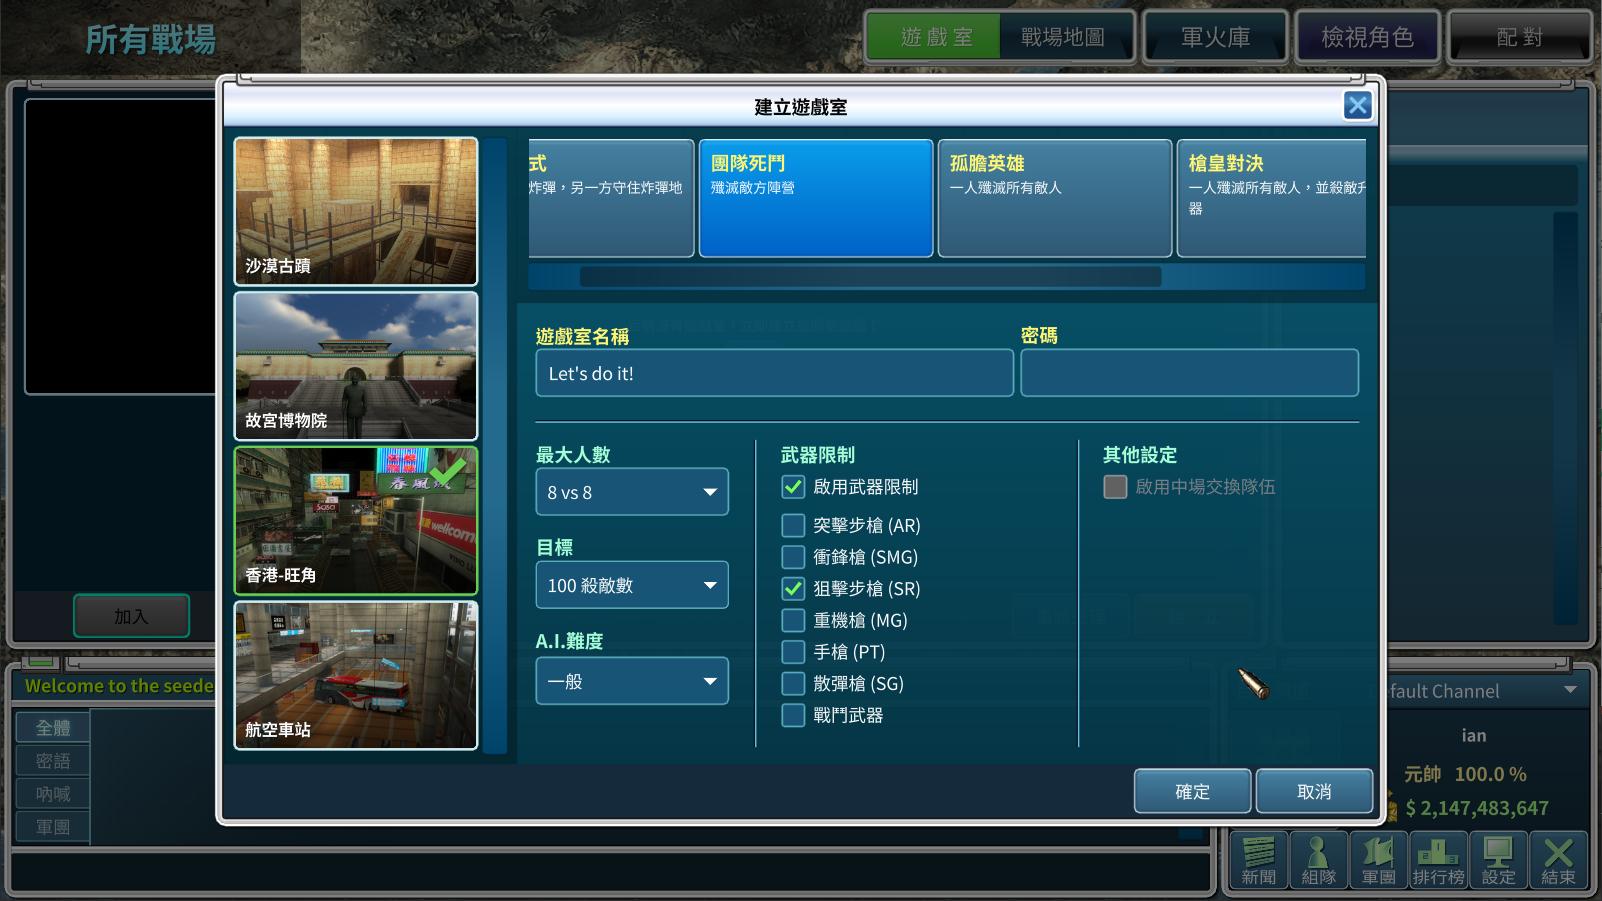 HEAT REBORN 遊戲開發進度更新